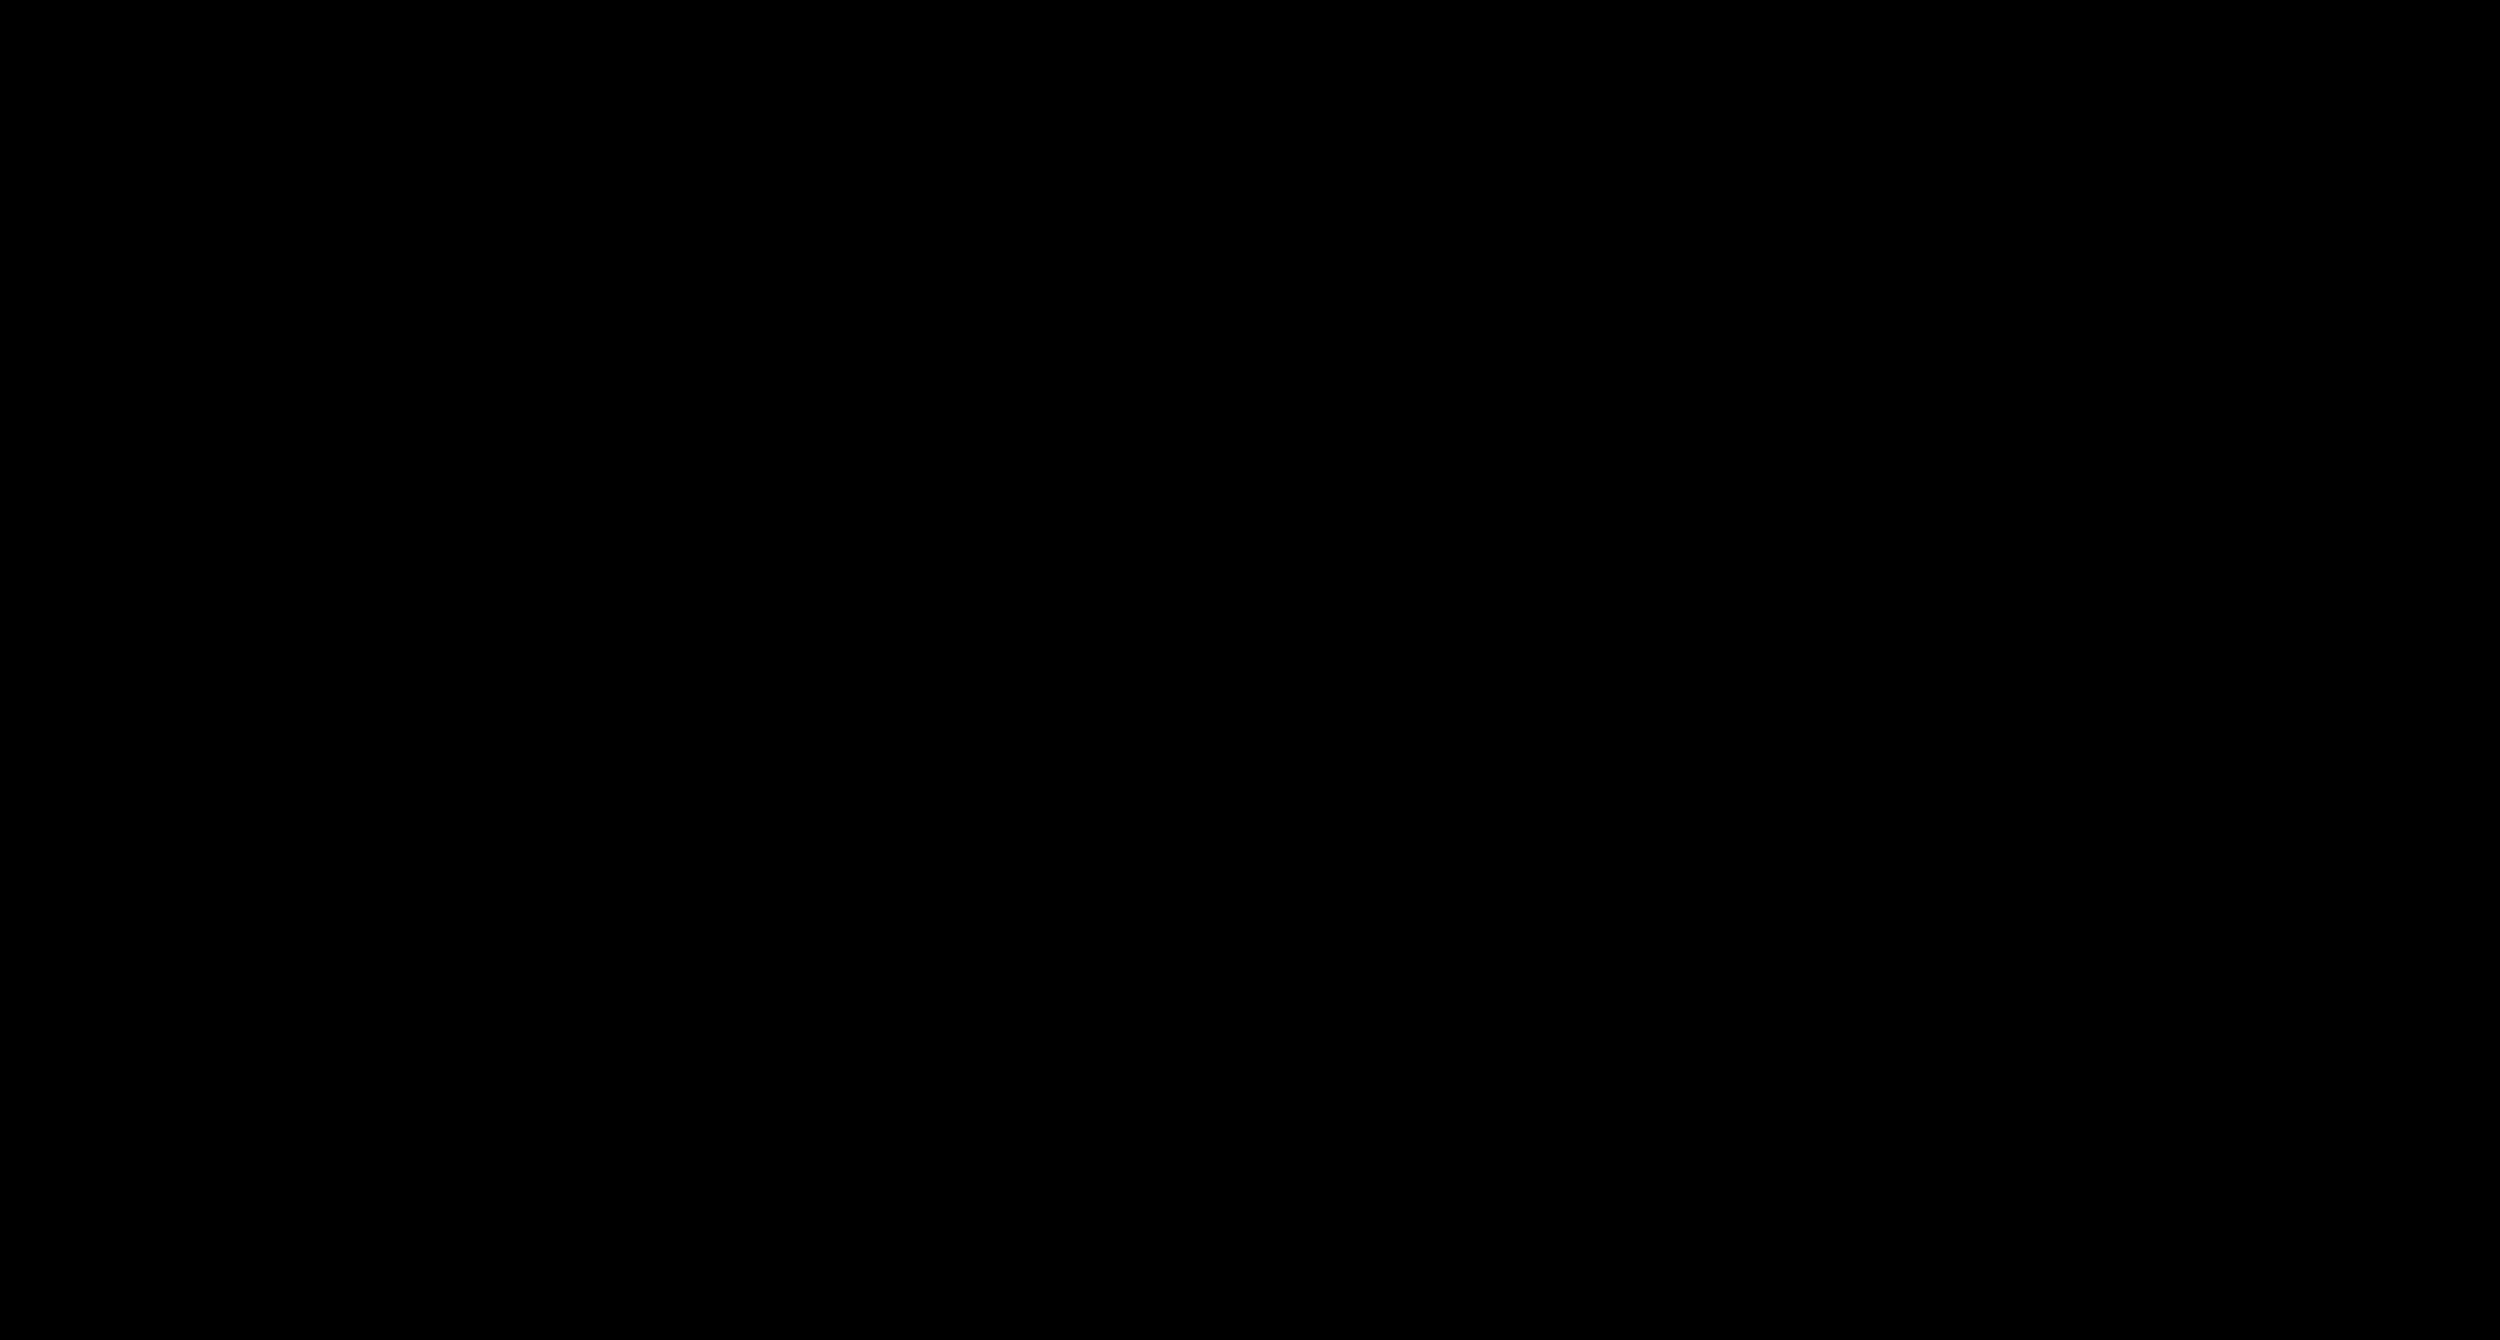 SM (Black - Transparent) (Final).png